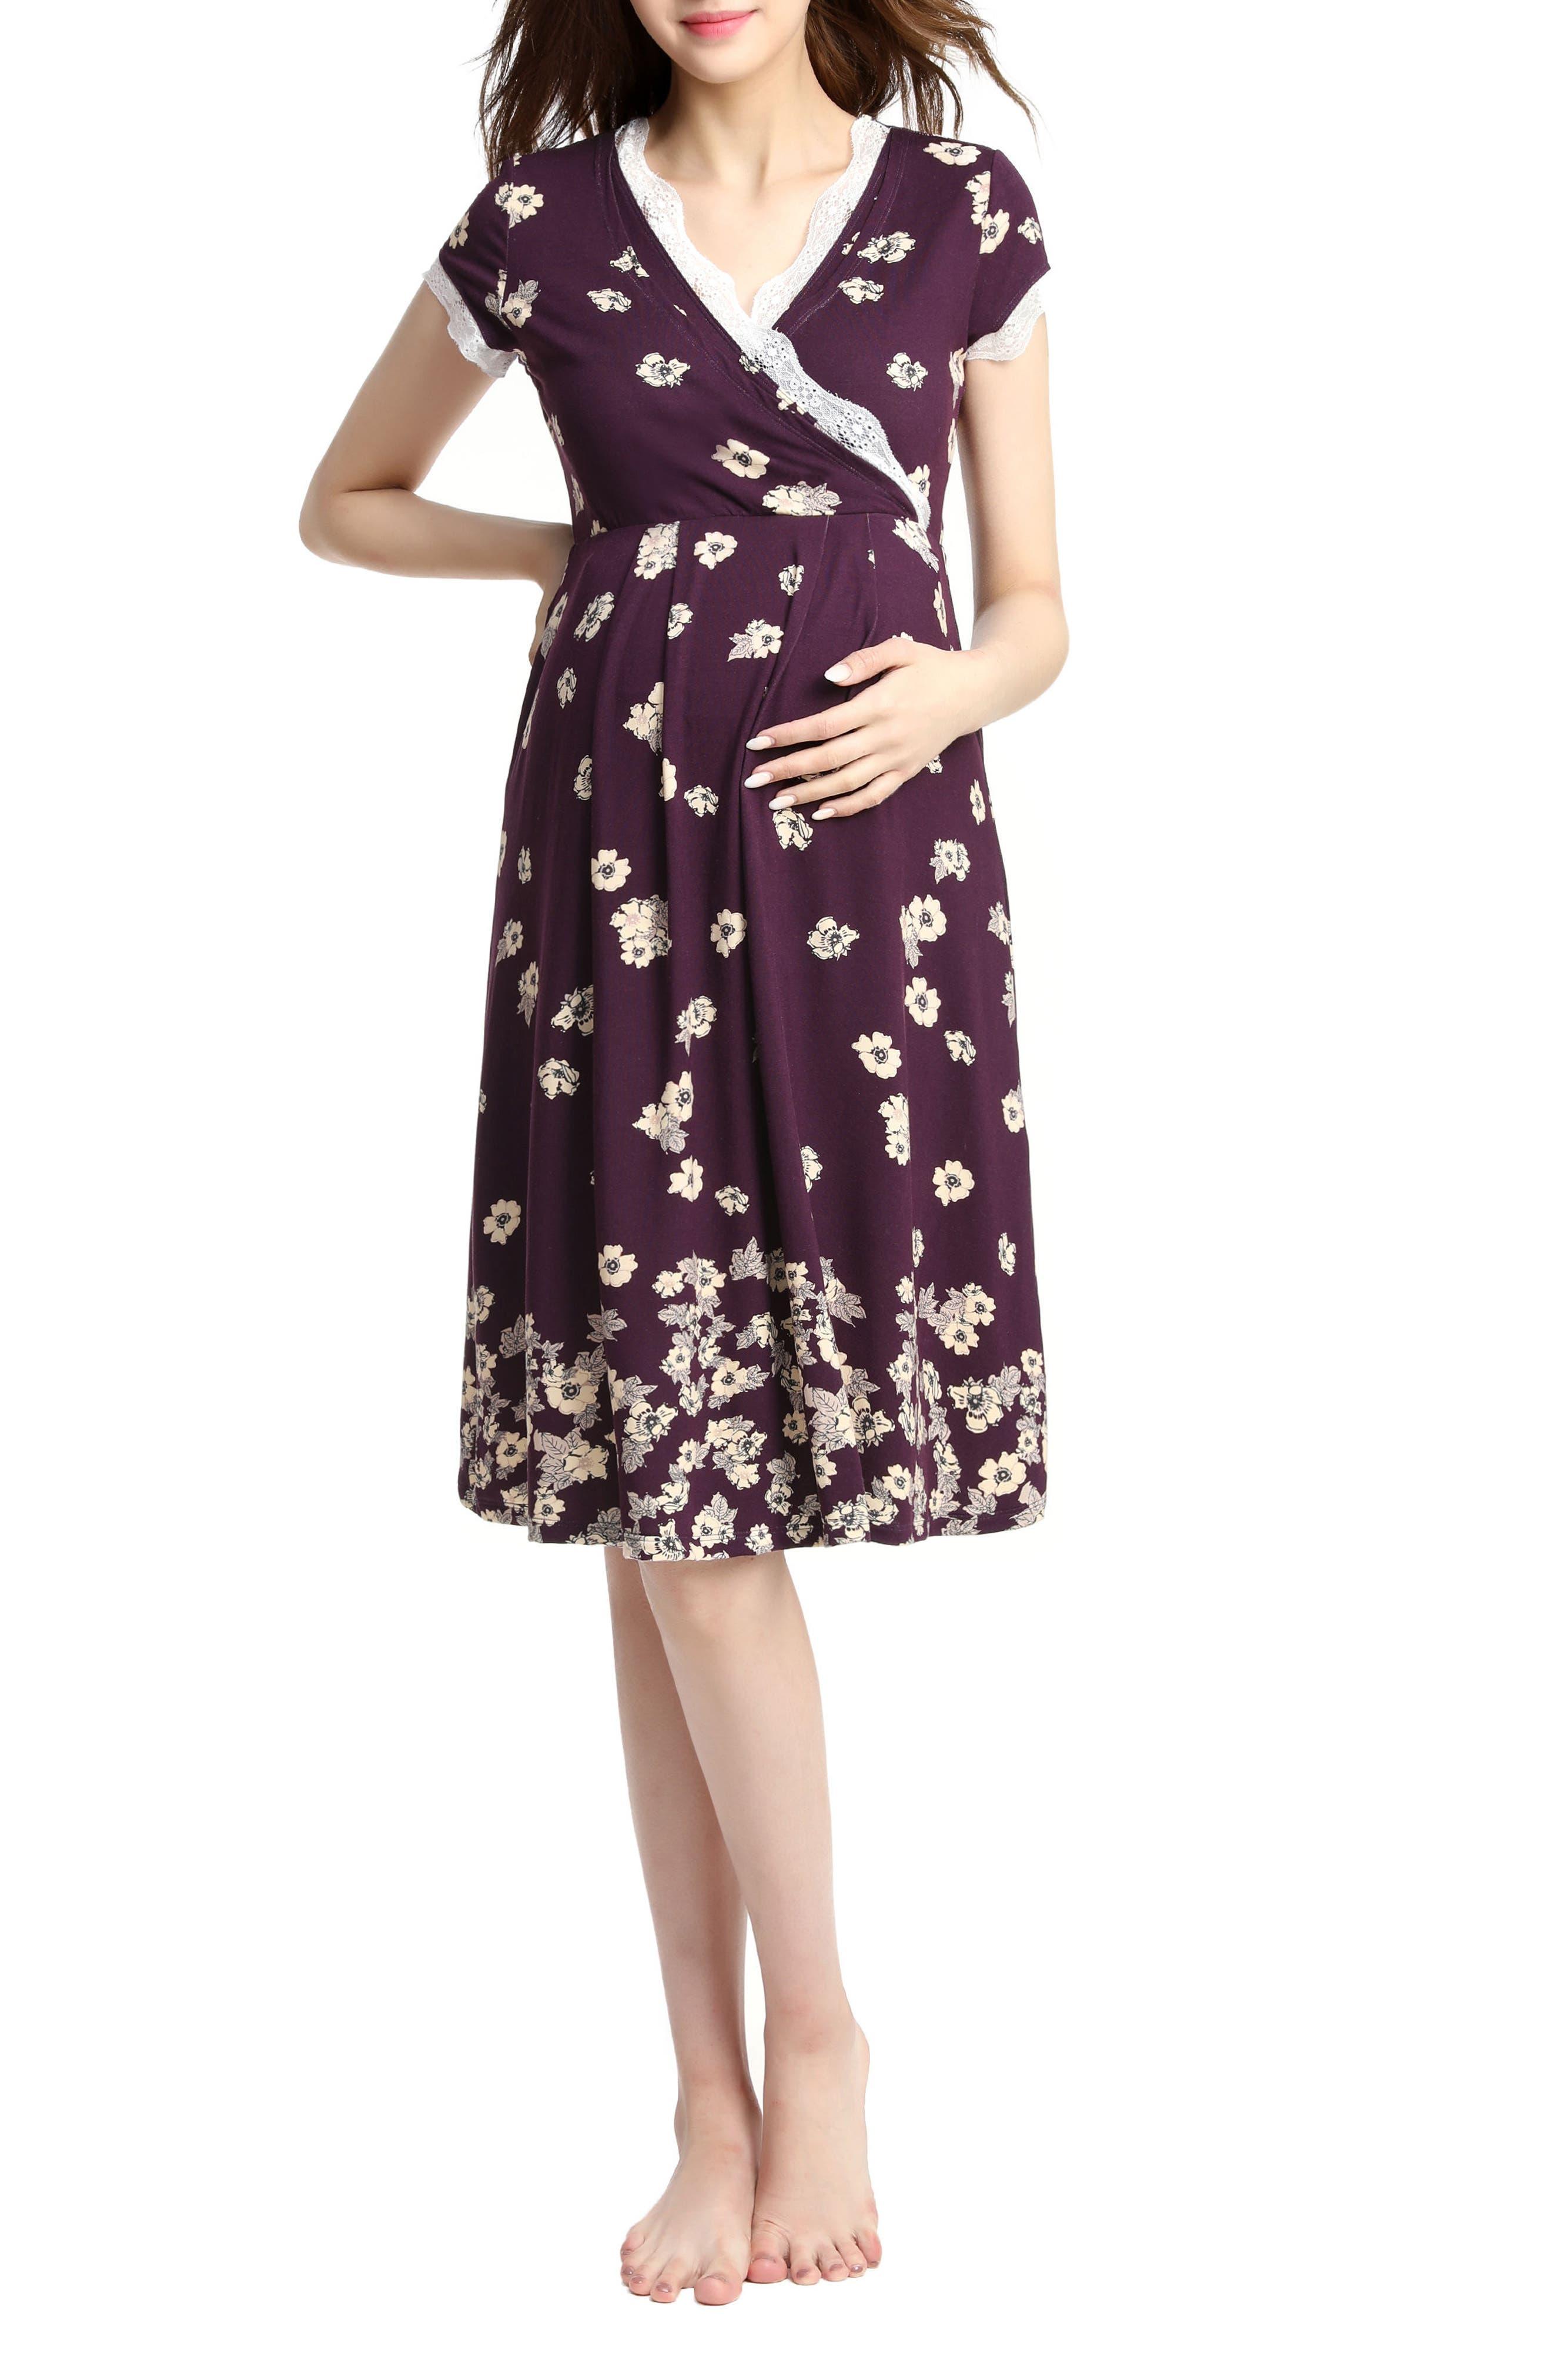 Vintage Style Maternity Clothes Womens Kimi  Kai Shae Print Nursingmaternity Chemise Size X-Large - Purple $68.00 AT vintagedancer.com